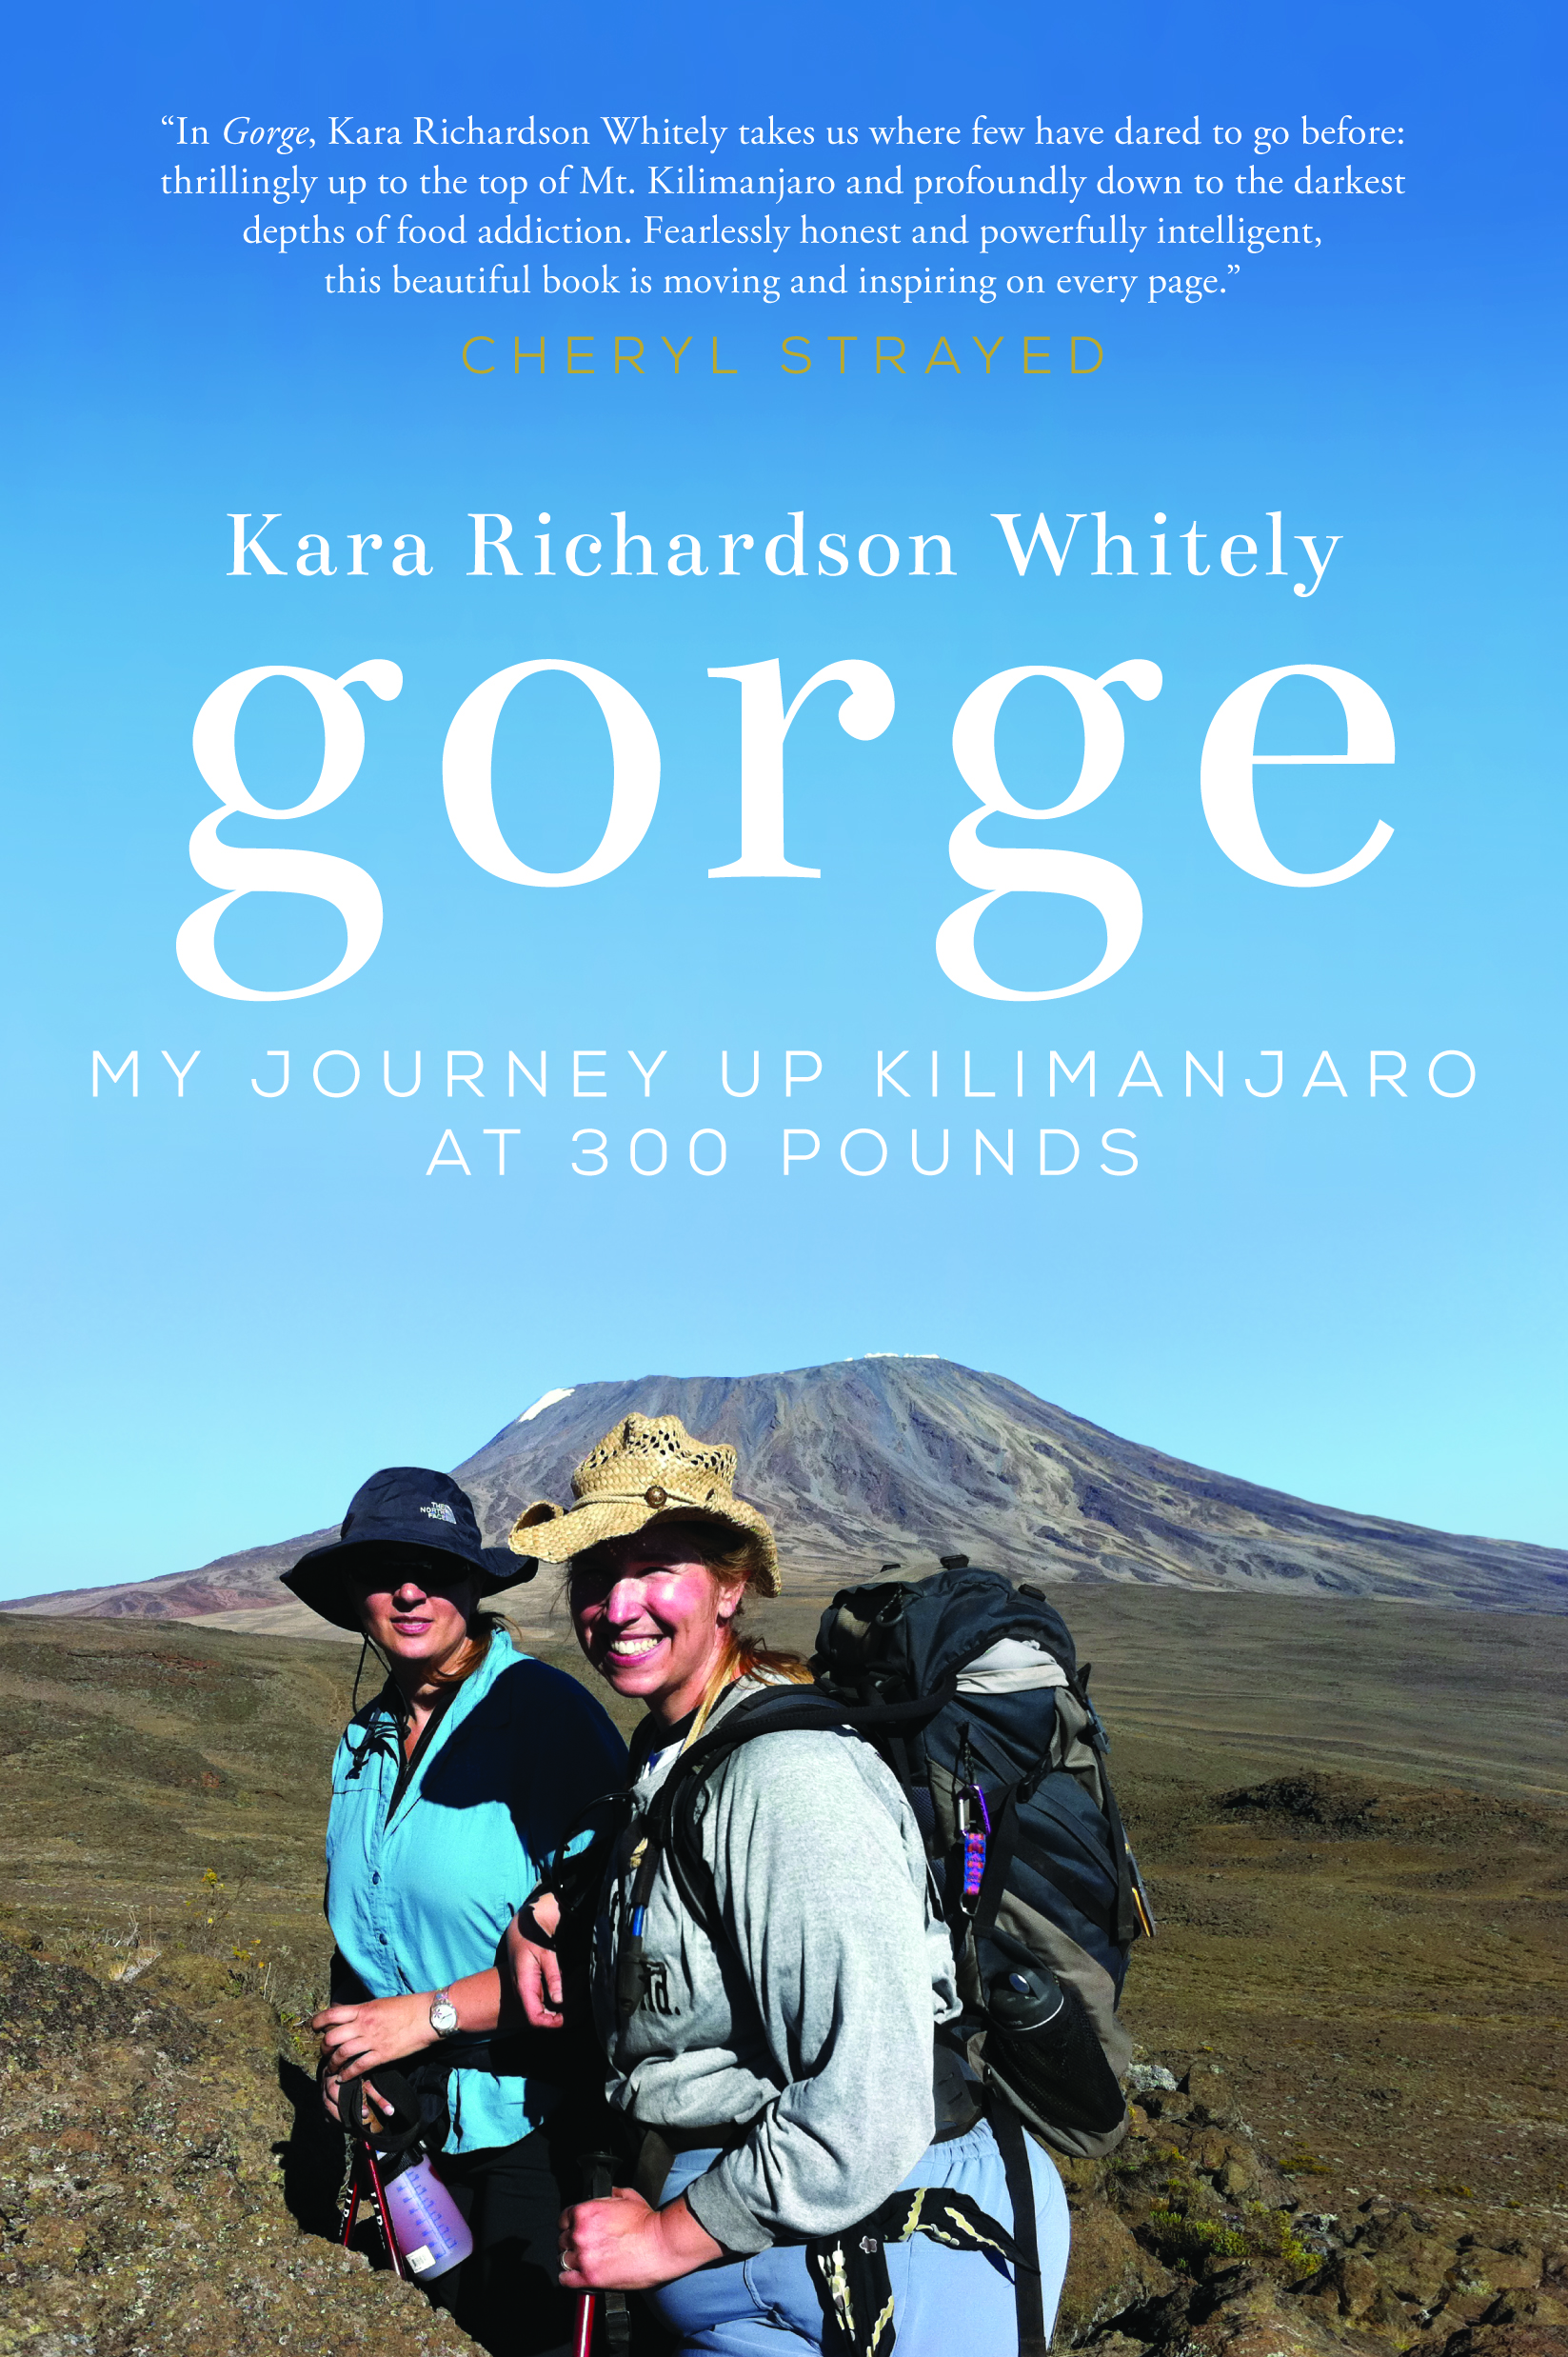 Buy Gorge: My Journey Up Kilimanjaro at 300 Pounds